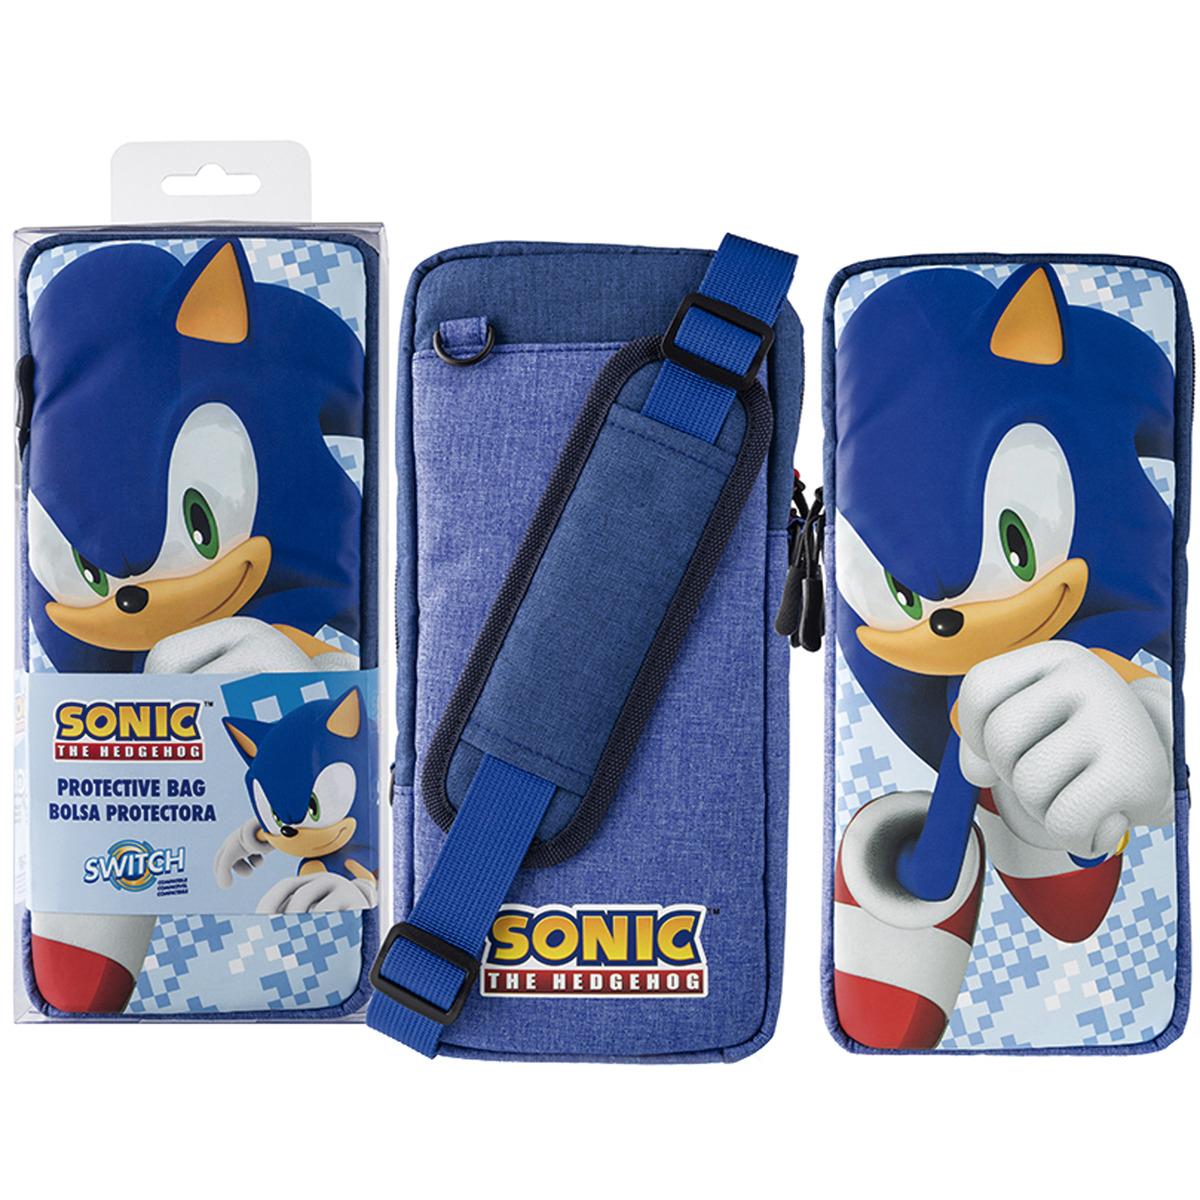 Bolsa para Nintendo Switch Sonic